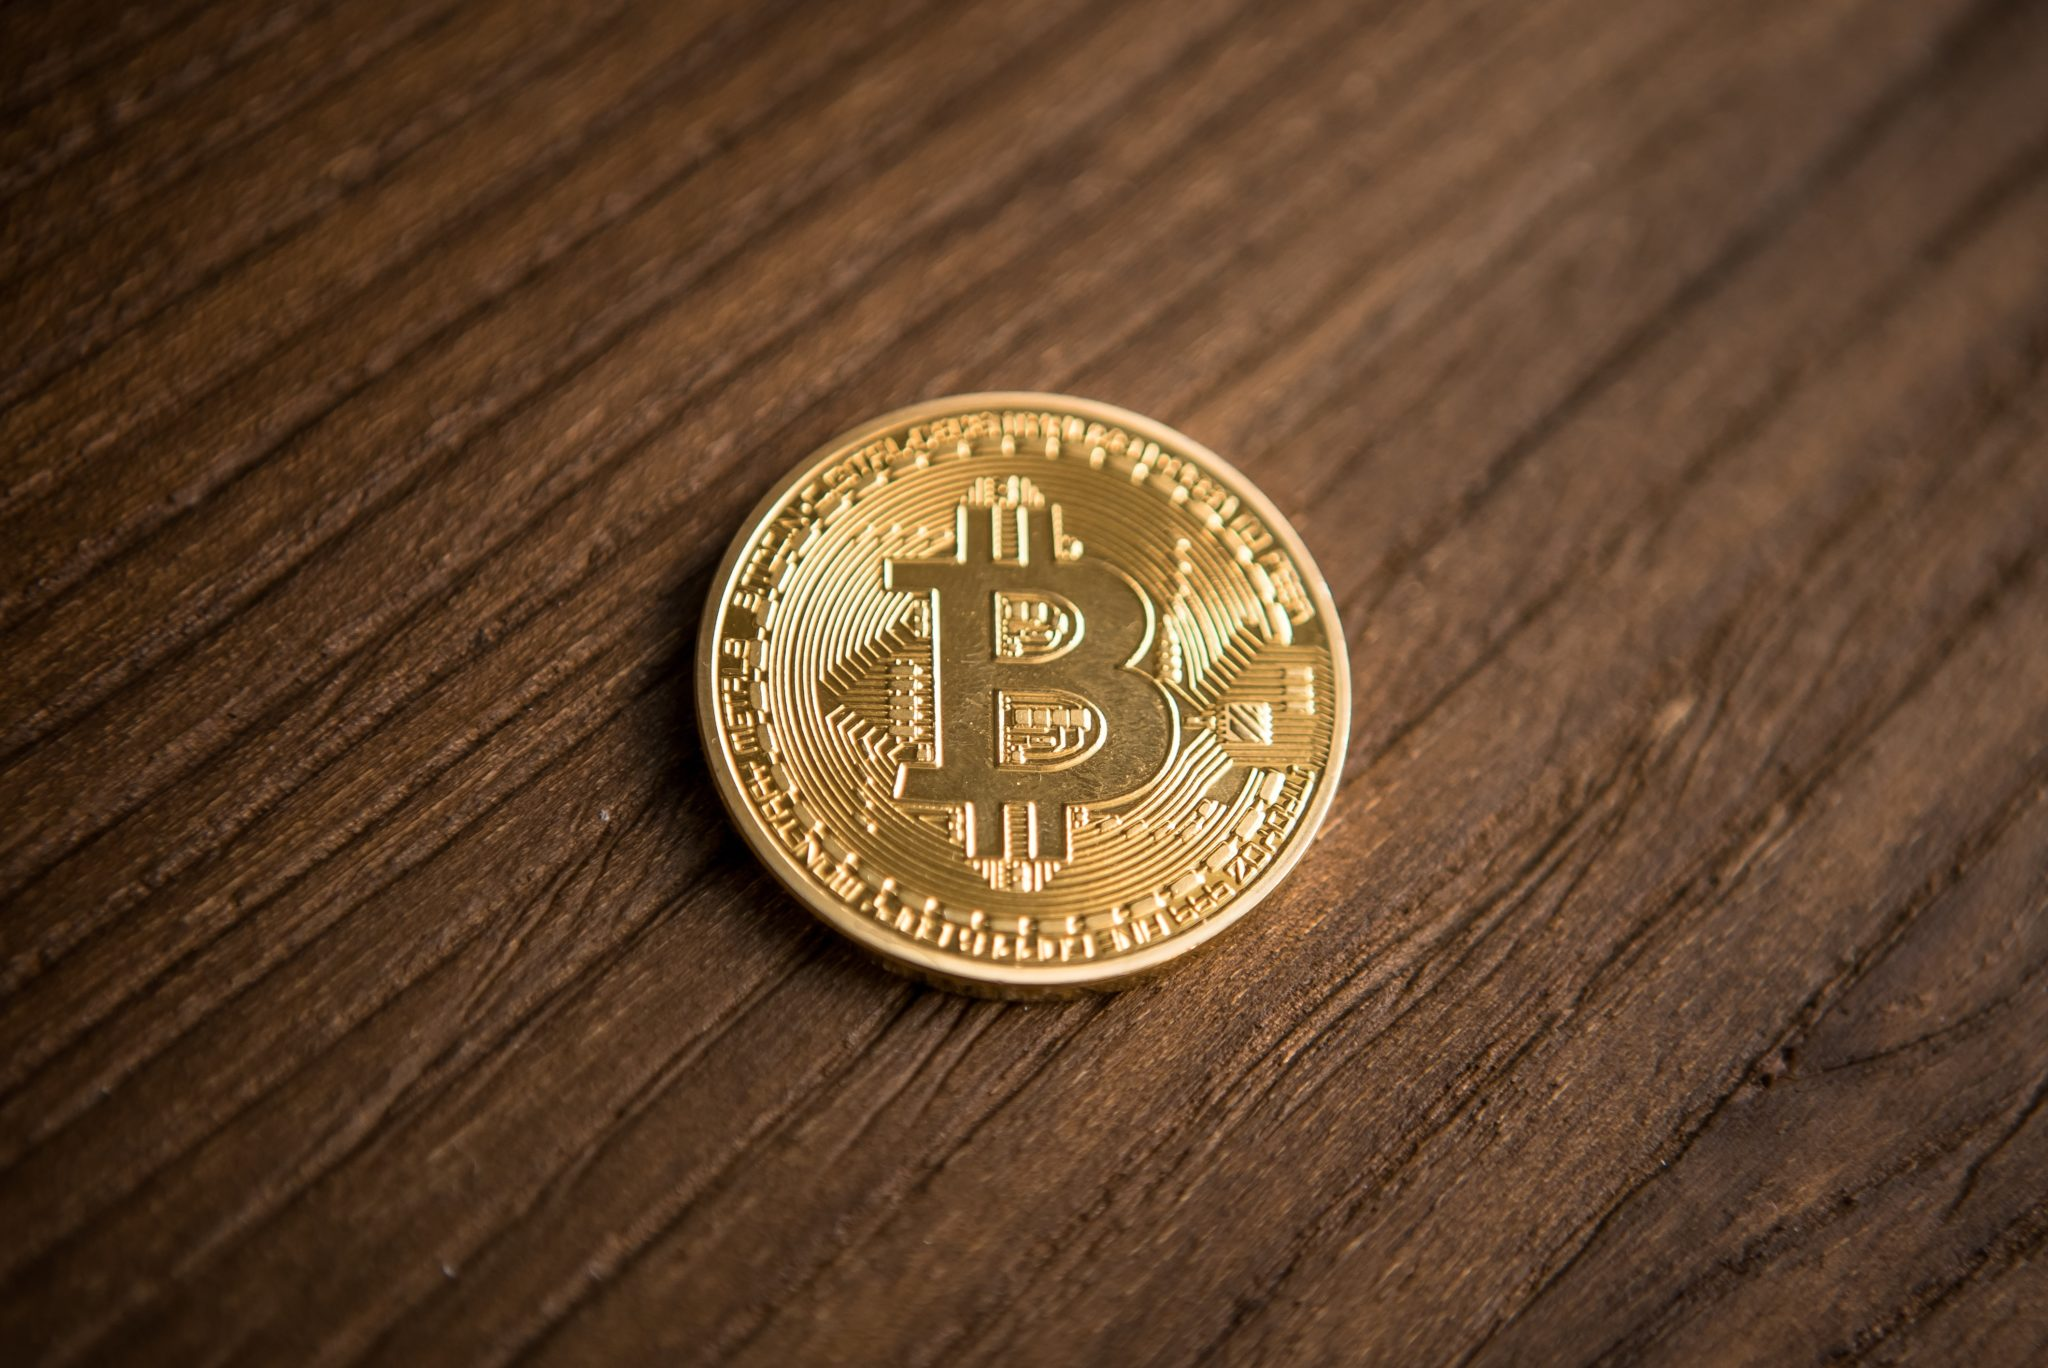 Bitcoin on Wood Grain